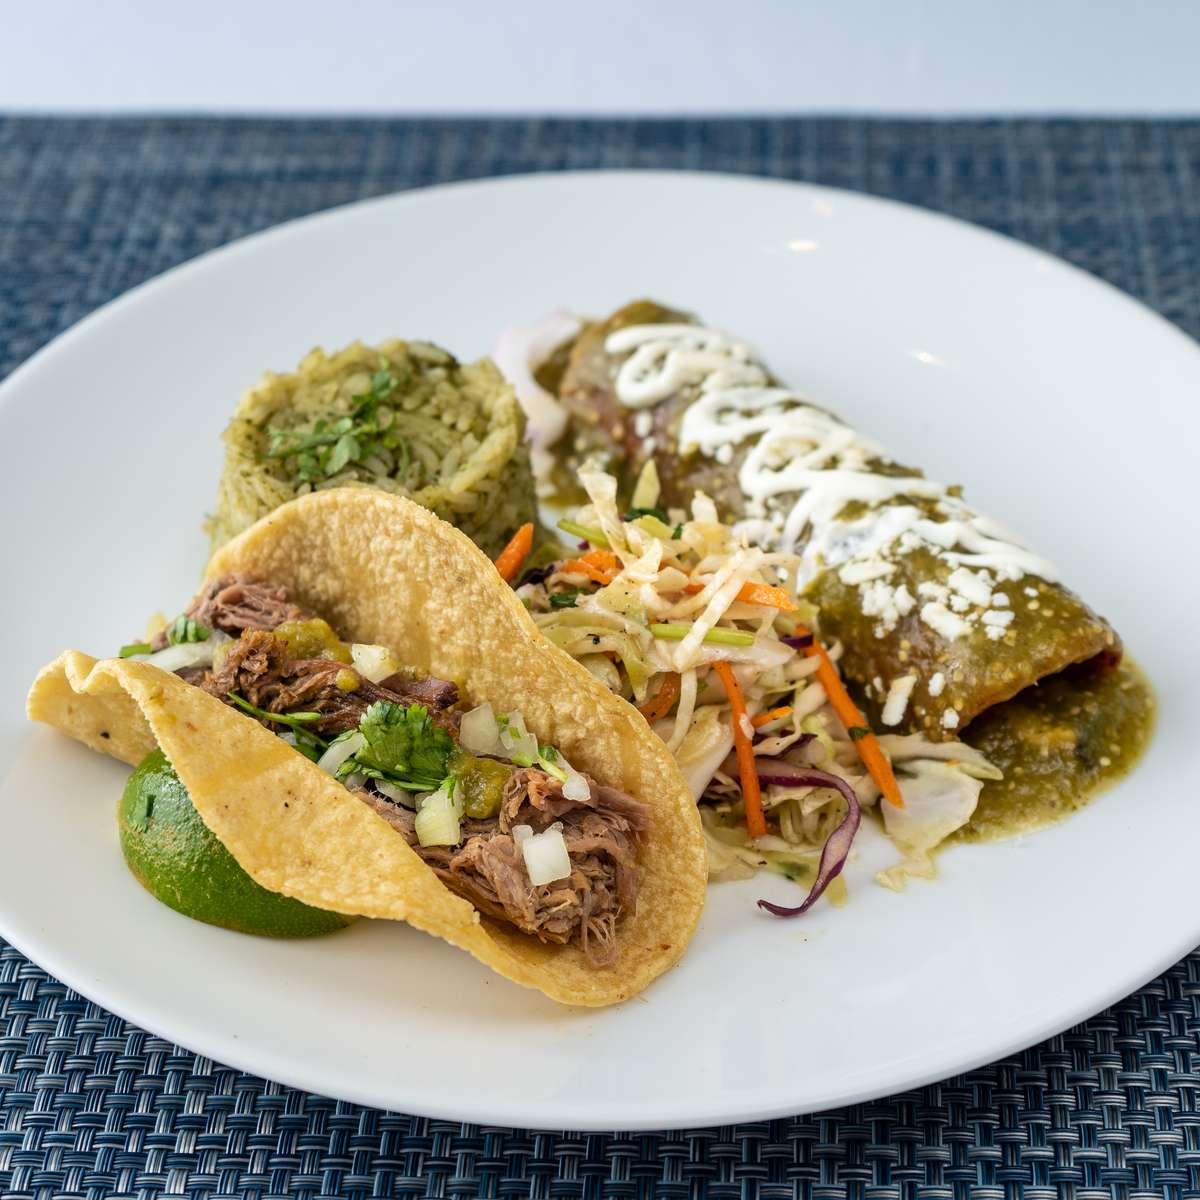 4. verdes enchilada, brisket taco, mesero slaw, arroz verde